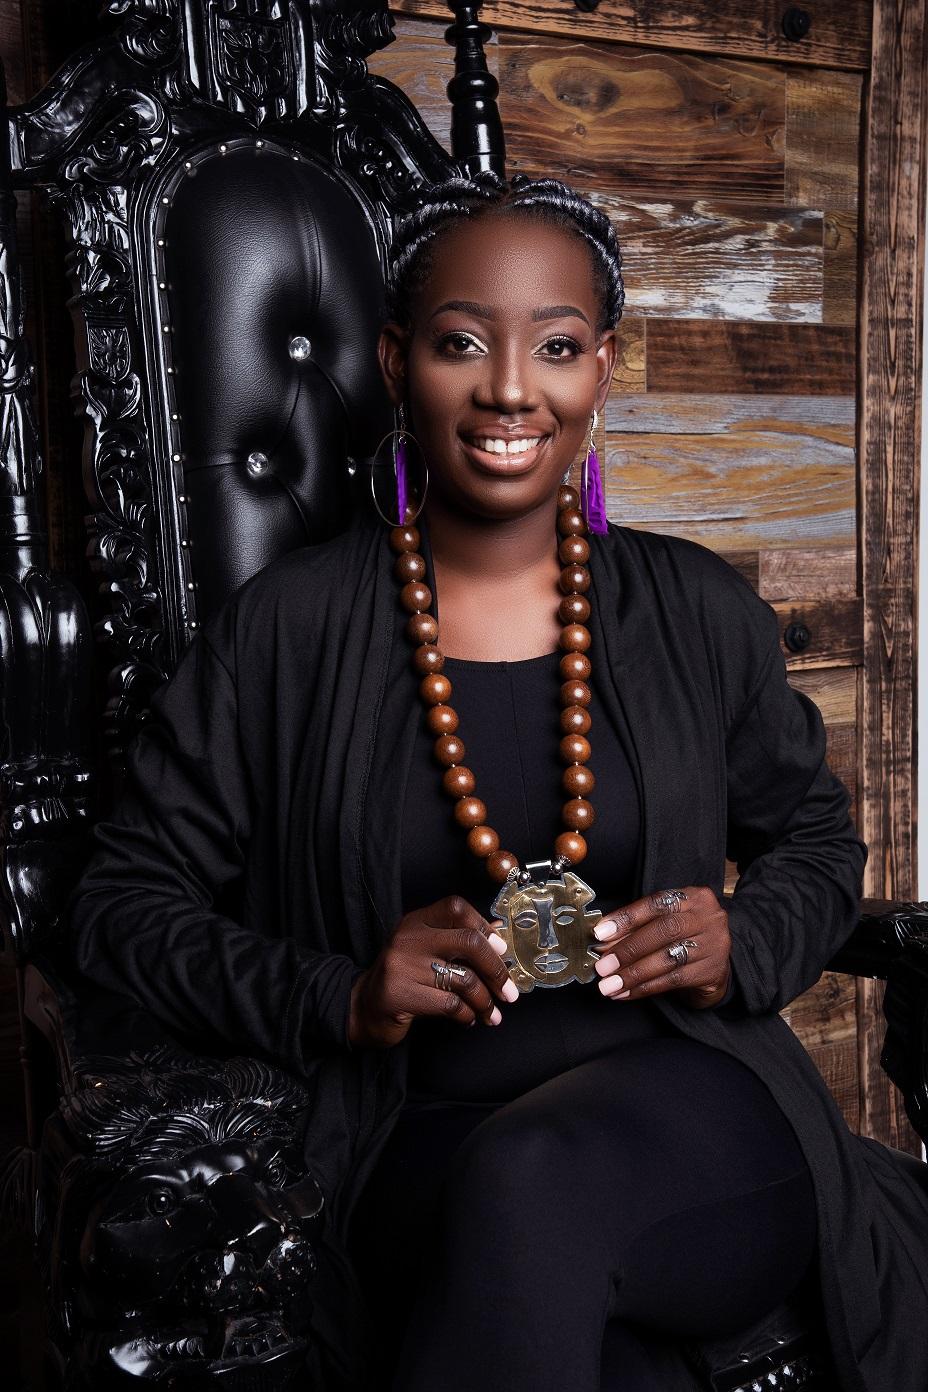 zuri-perle-african-inspired-accessory-brand-lead-designer-and-owner-atinuke-osibogun-adeleke.jpg